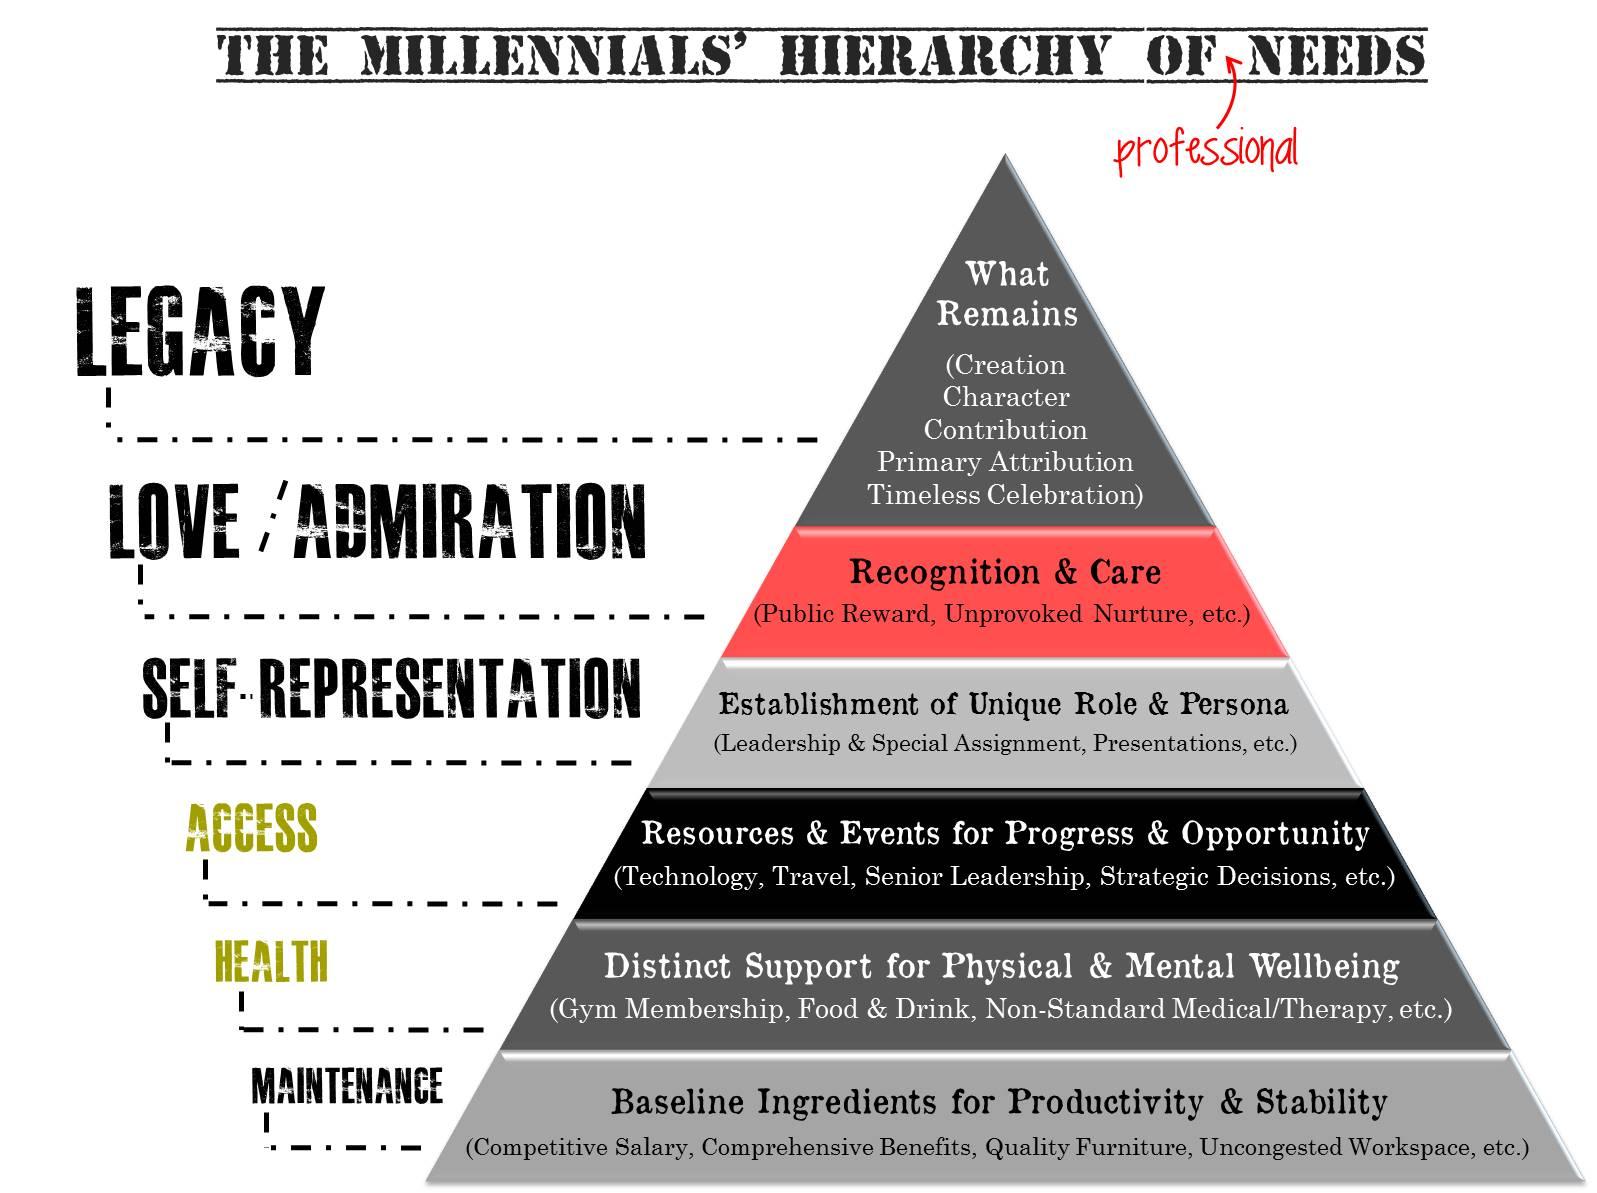 millennials' hierarchy of professional needs by benjamin mann